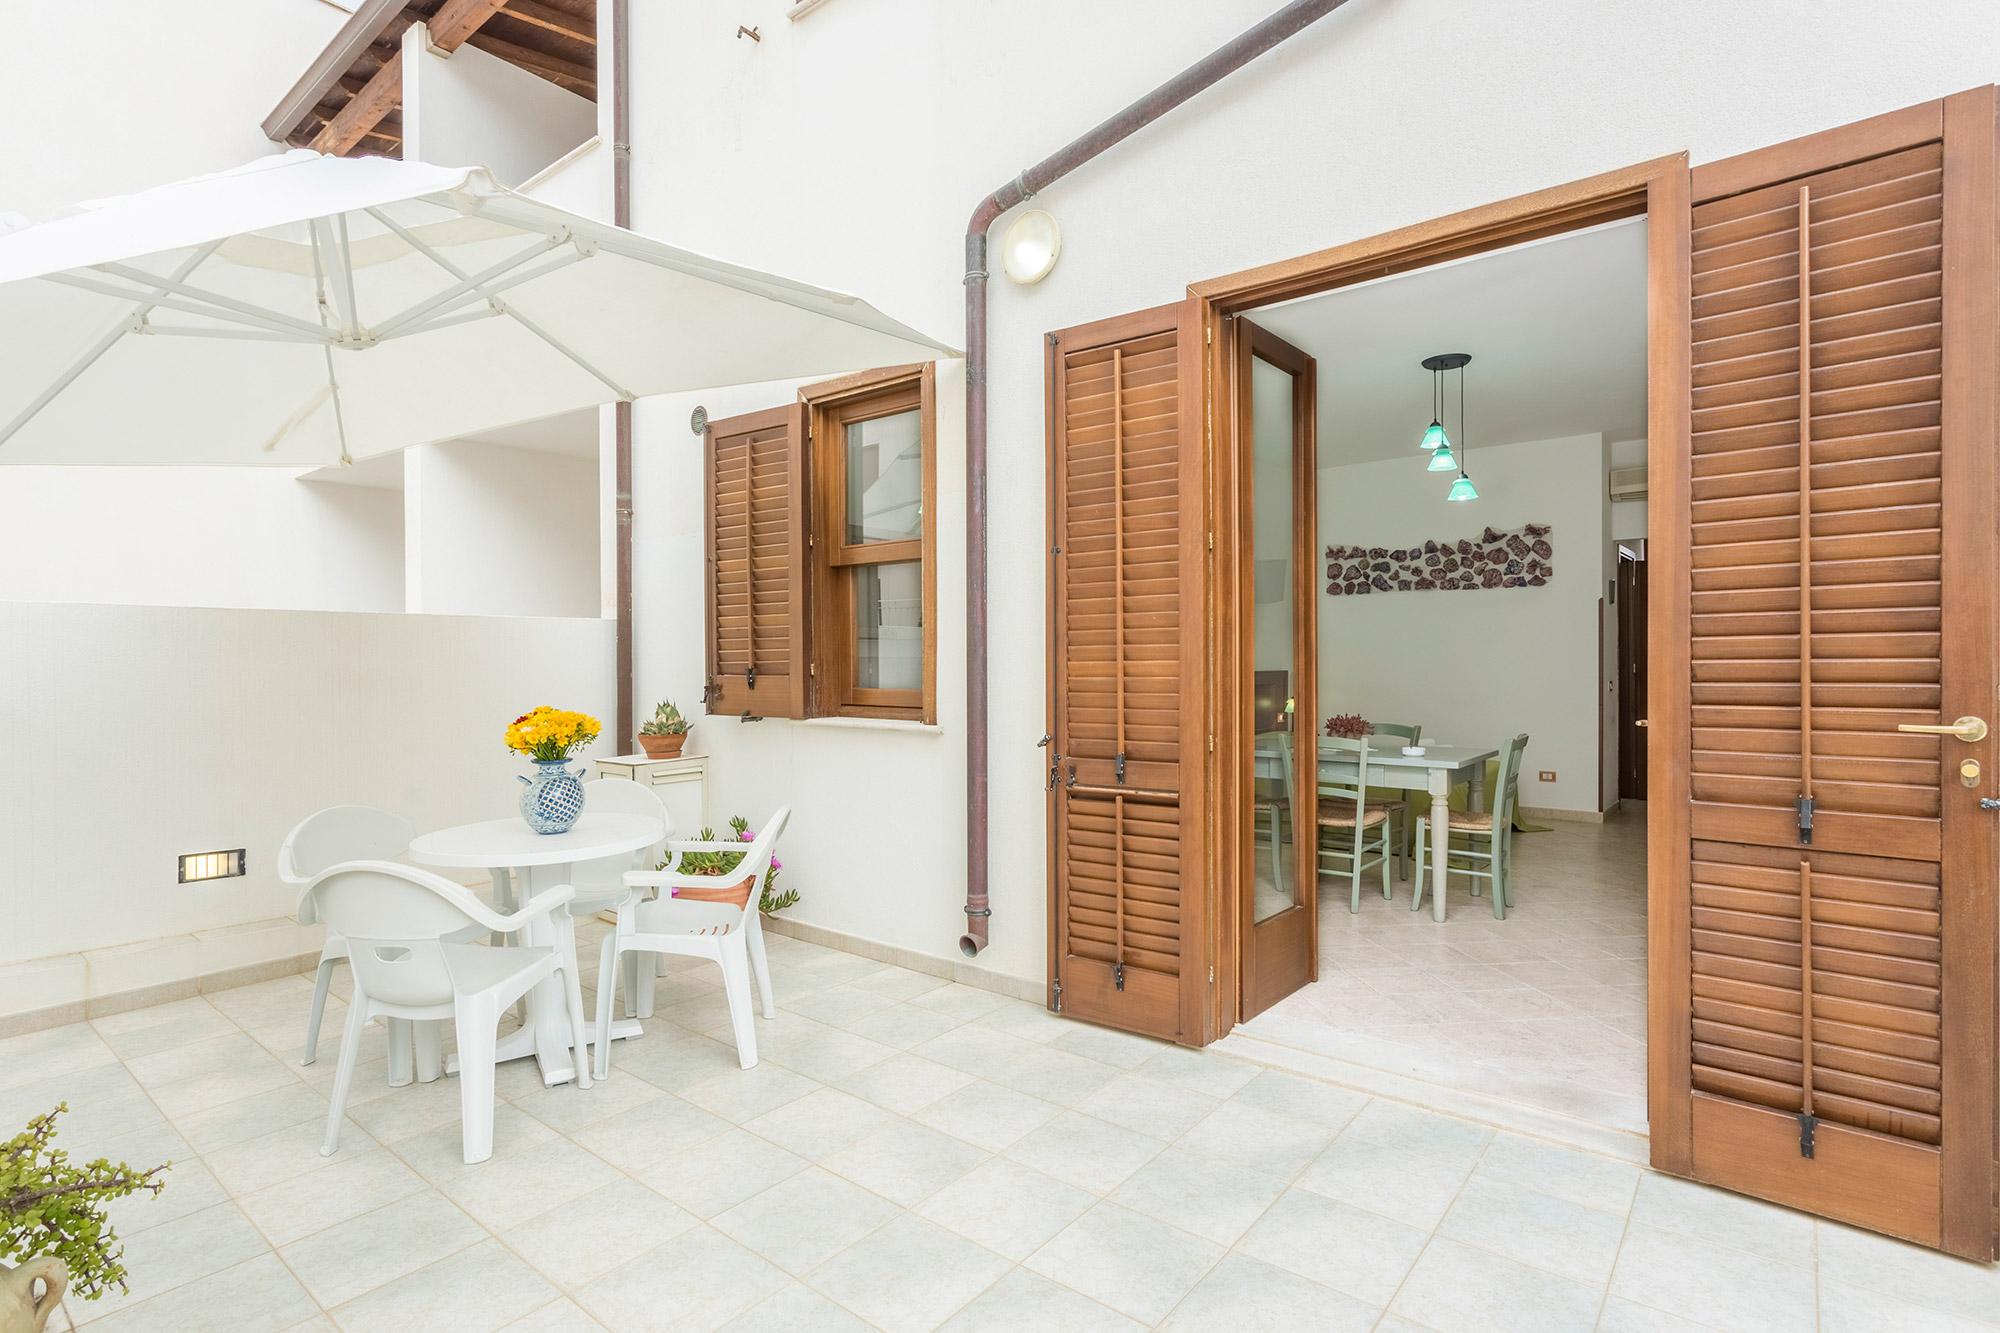 Monovano senza Barriere - Poseidon Residence - San Vito Lo Capo